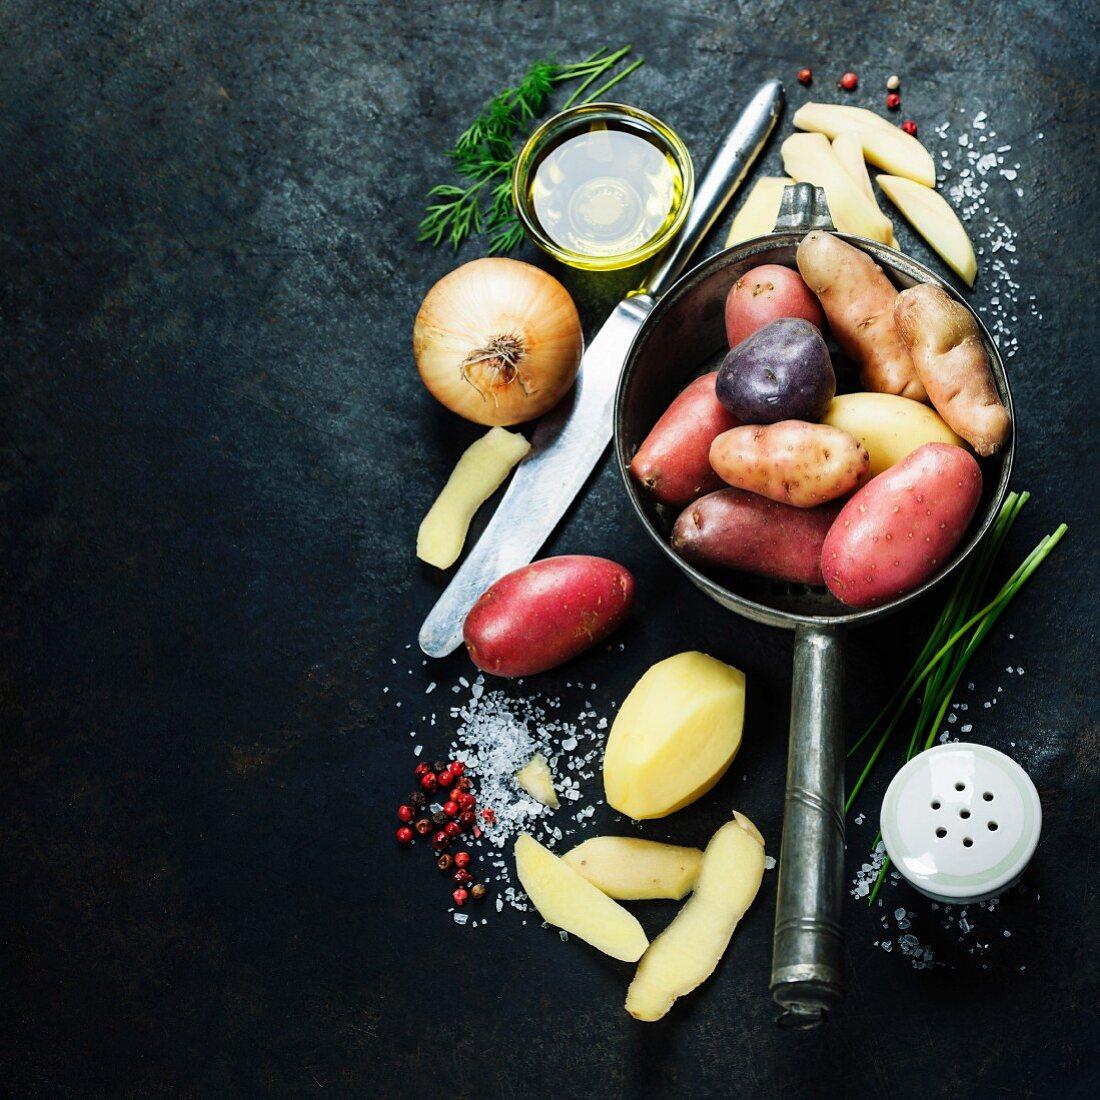 Potato preparation, fresh organic vegetables